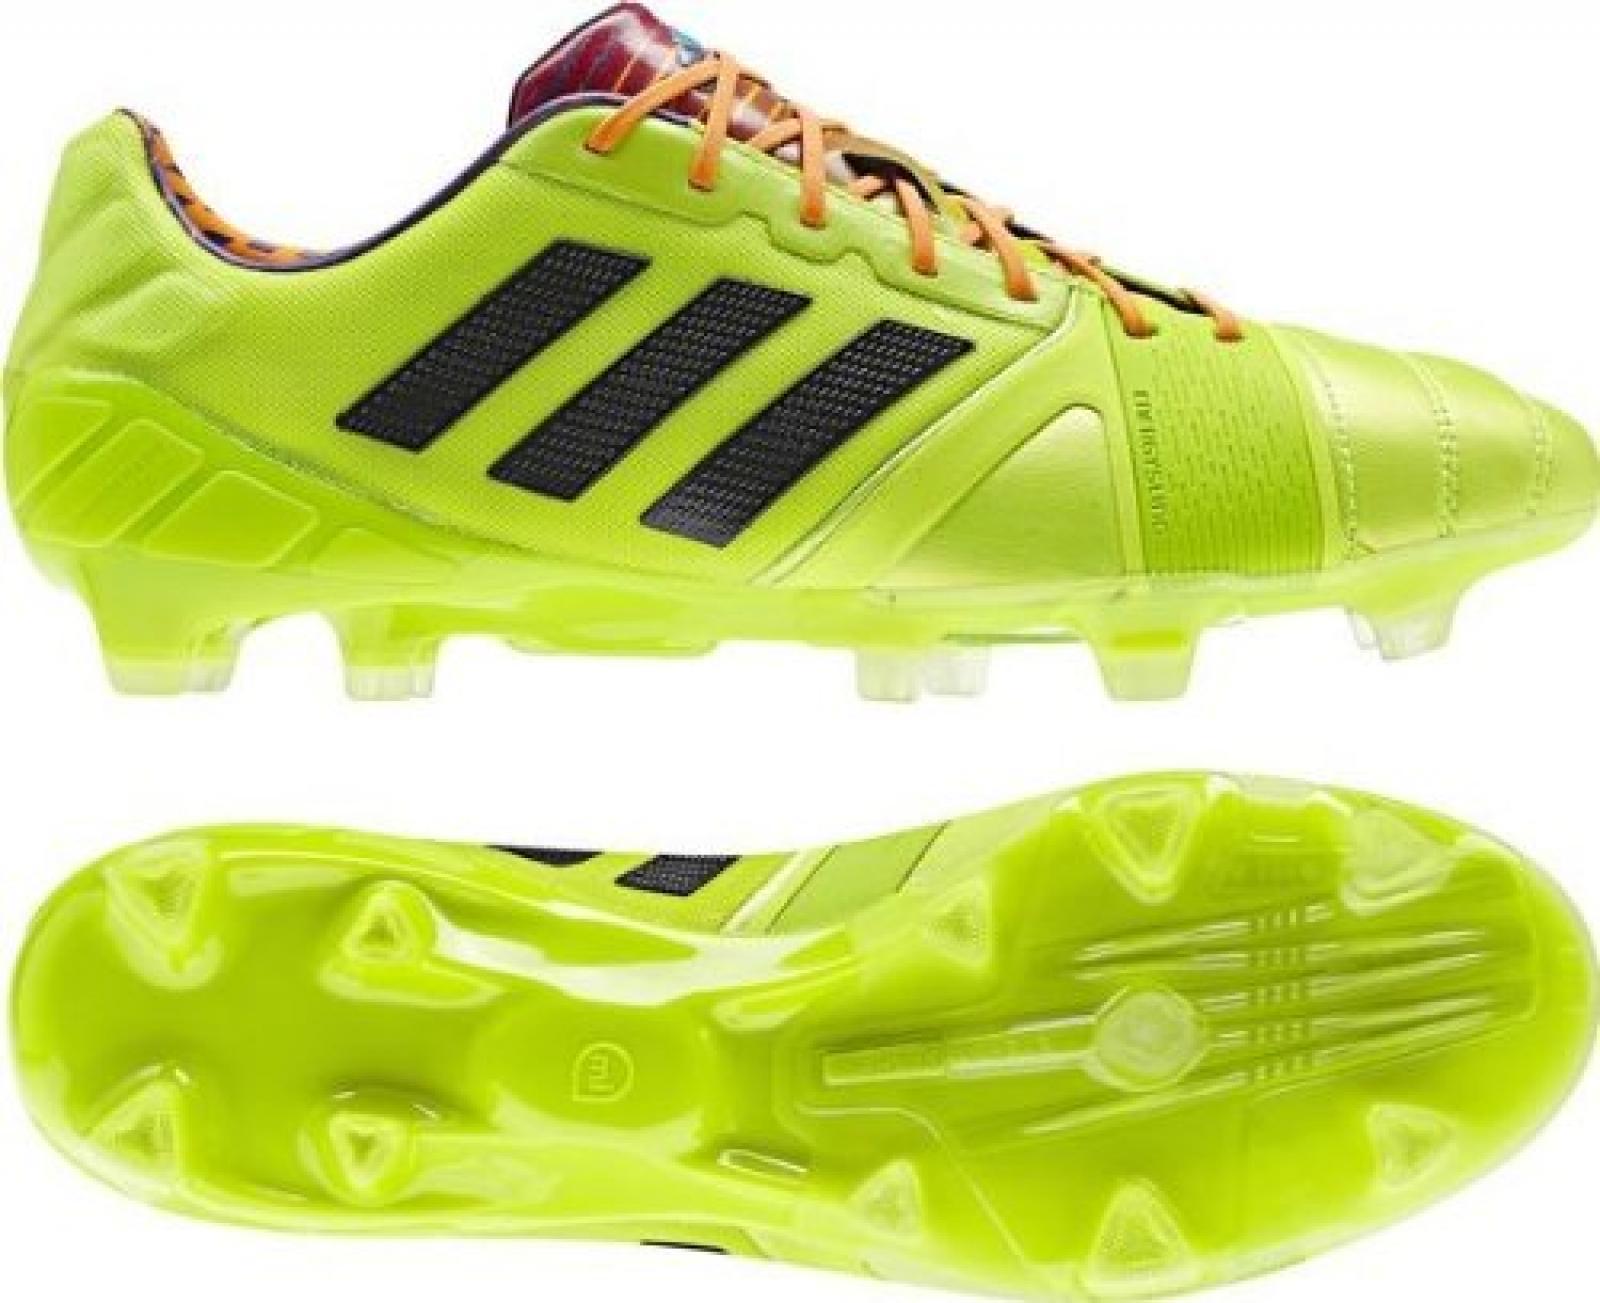 Adidas nitrocharge 1.0 TRX FG Fußballschuh Herren